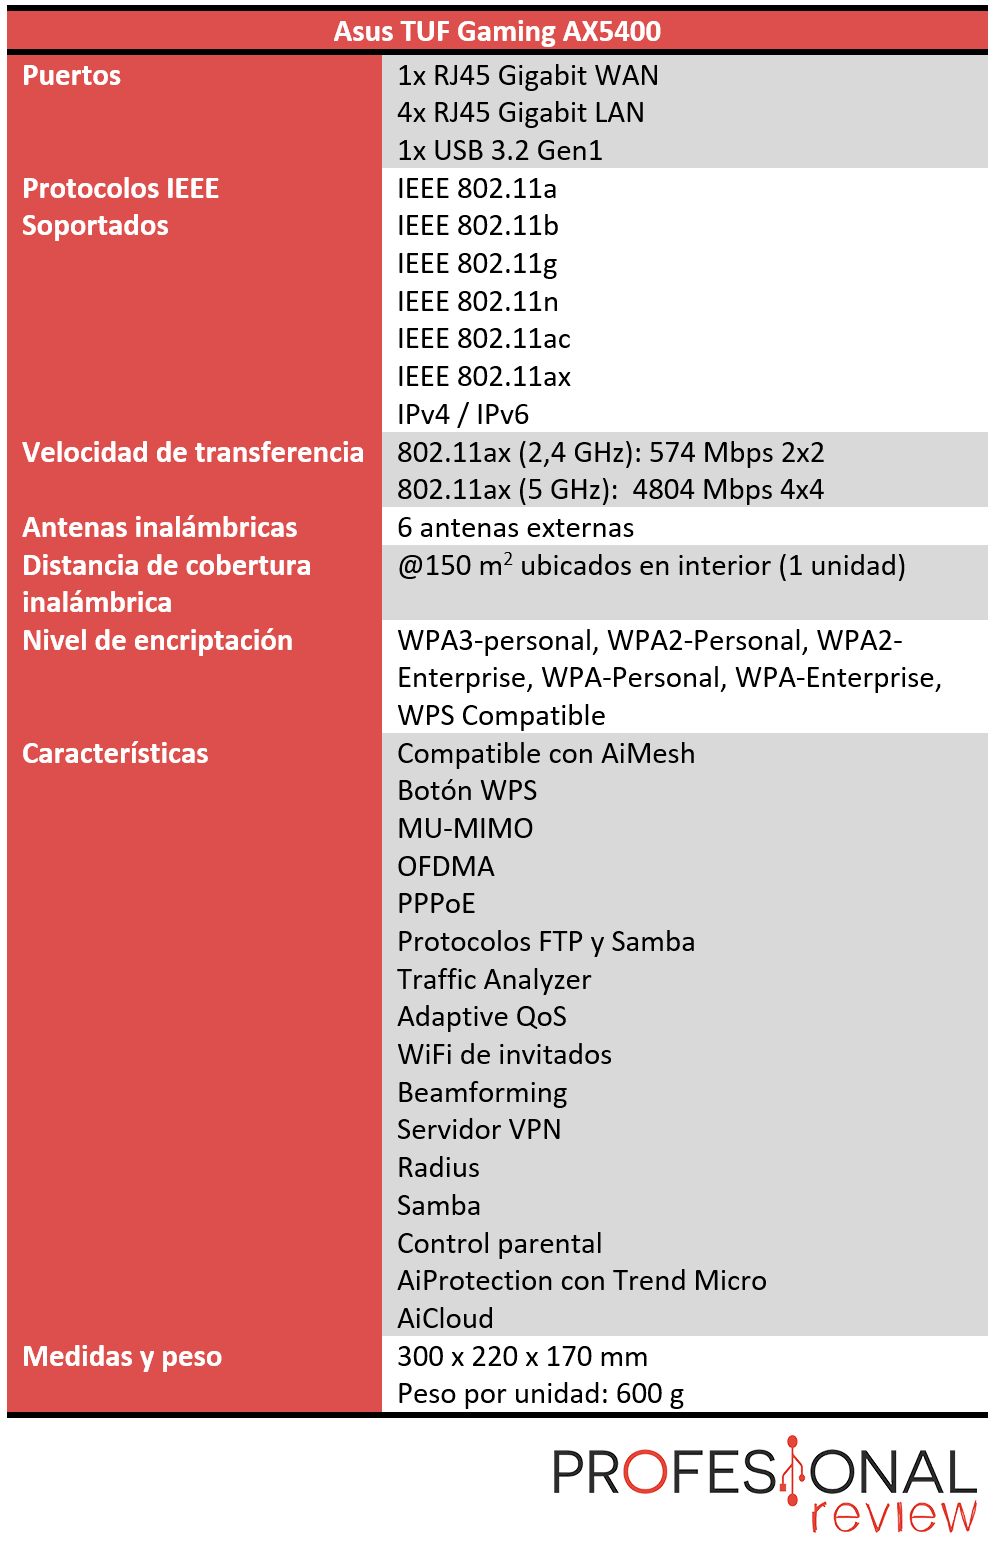 Asus TUF Gaming AX5400 Características